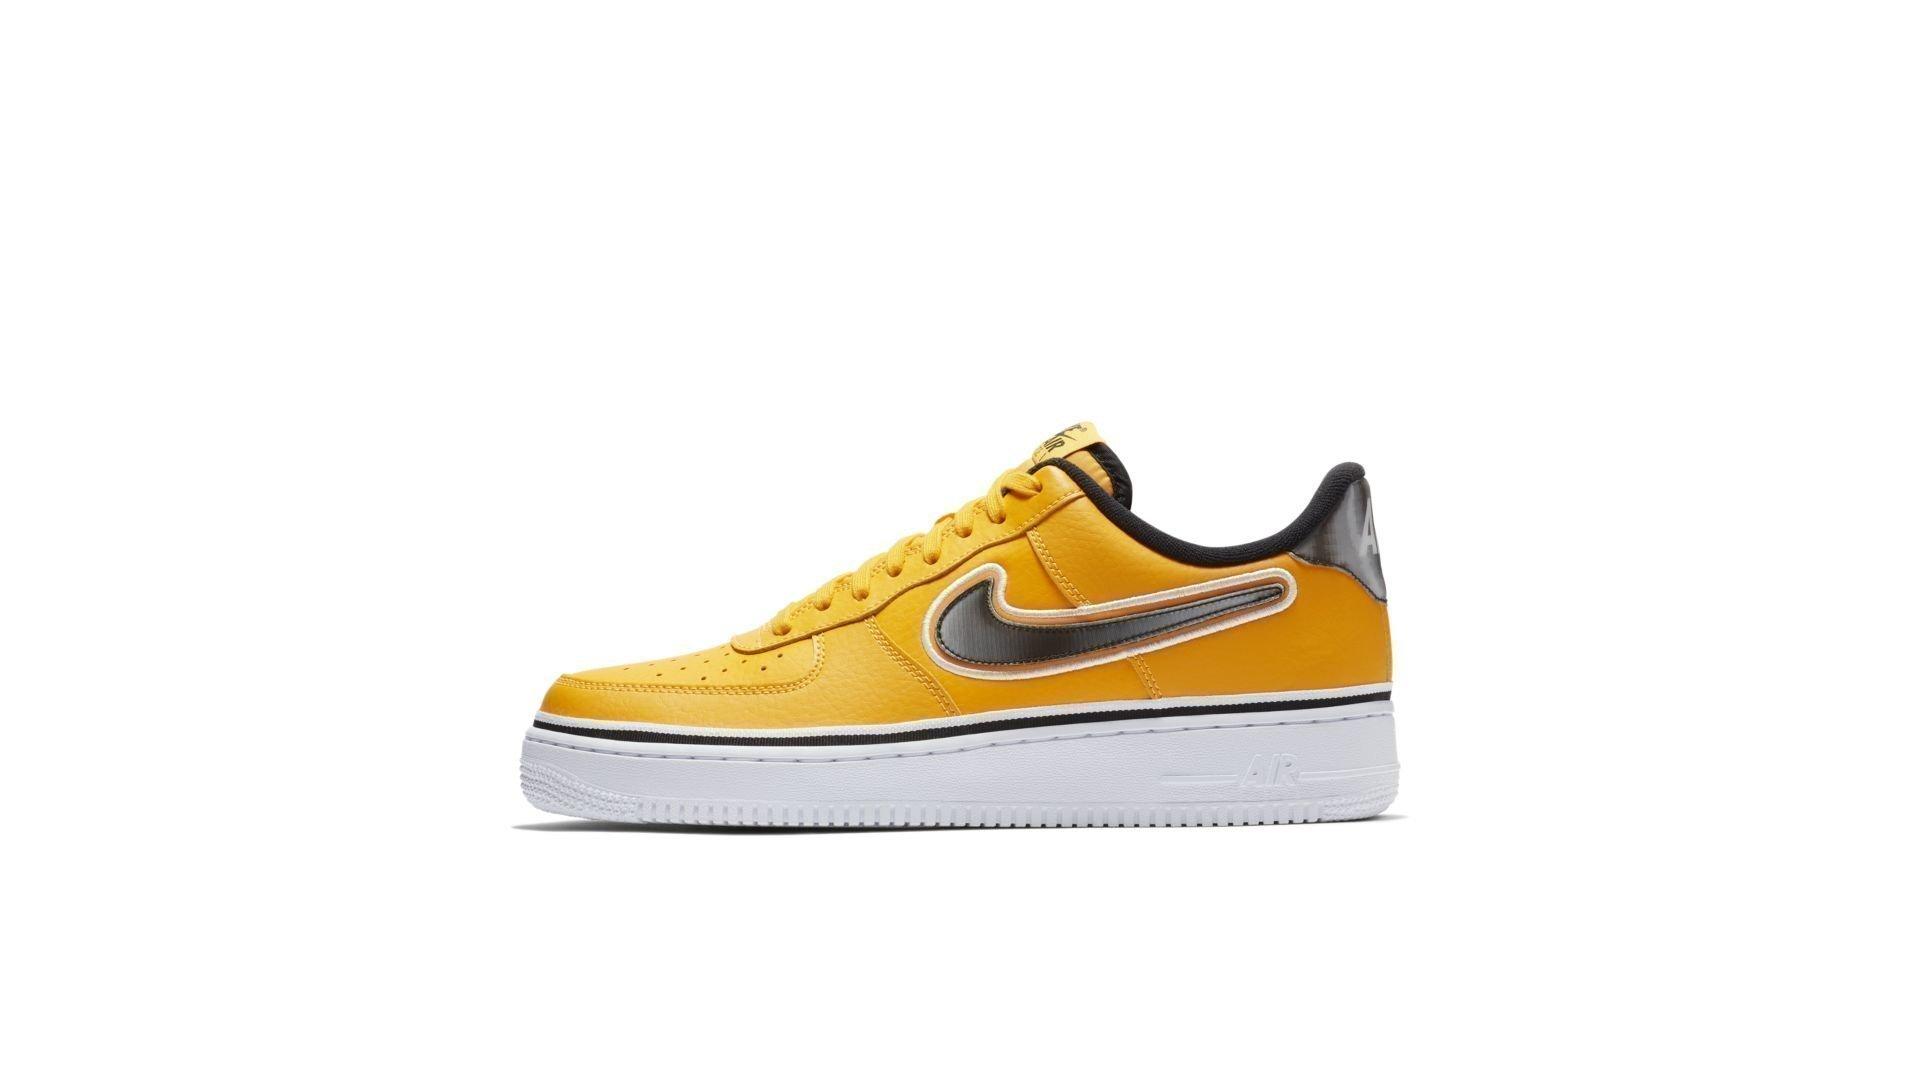 Nike Air Force 1 Low Sport NBA University Gold BV1168 700